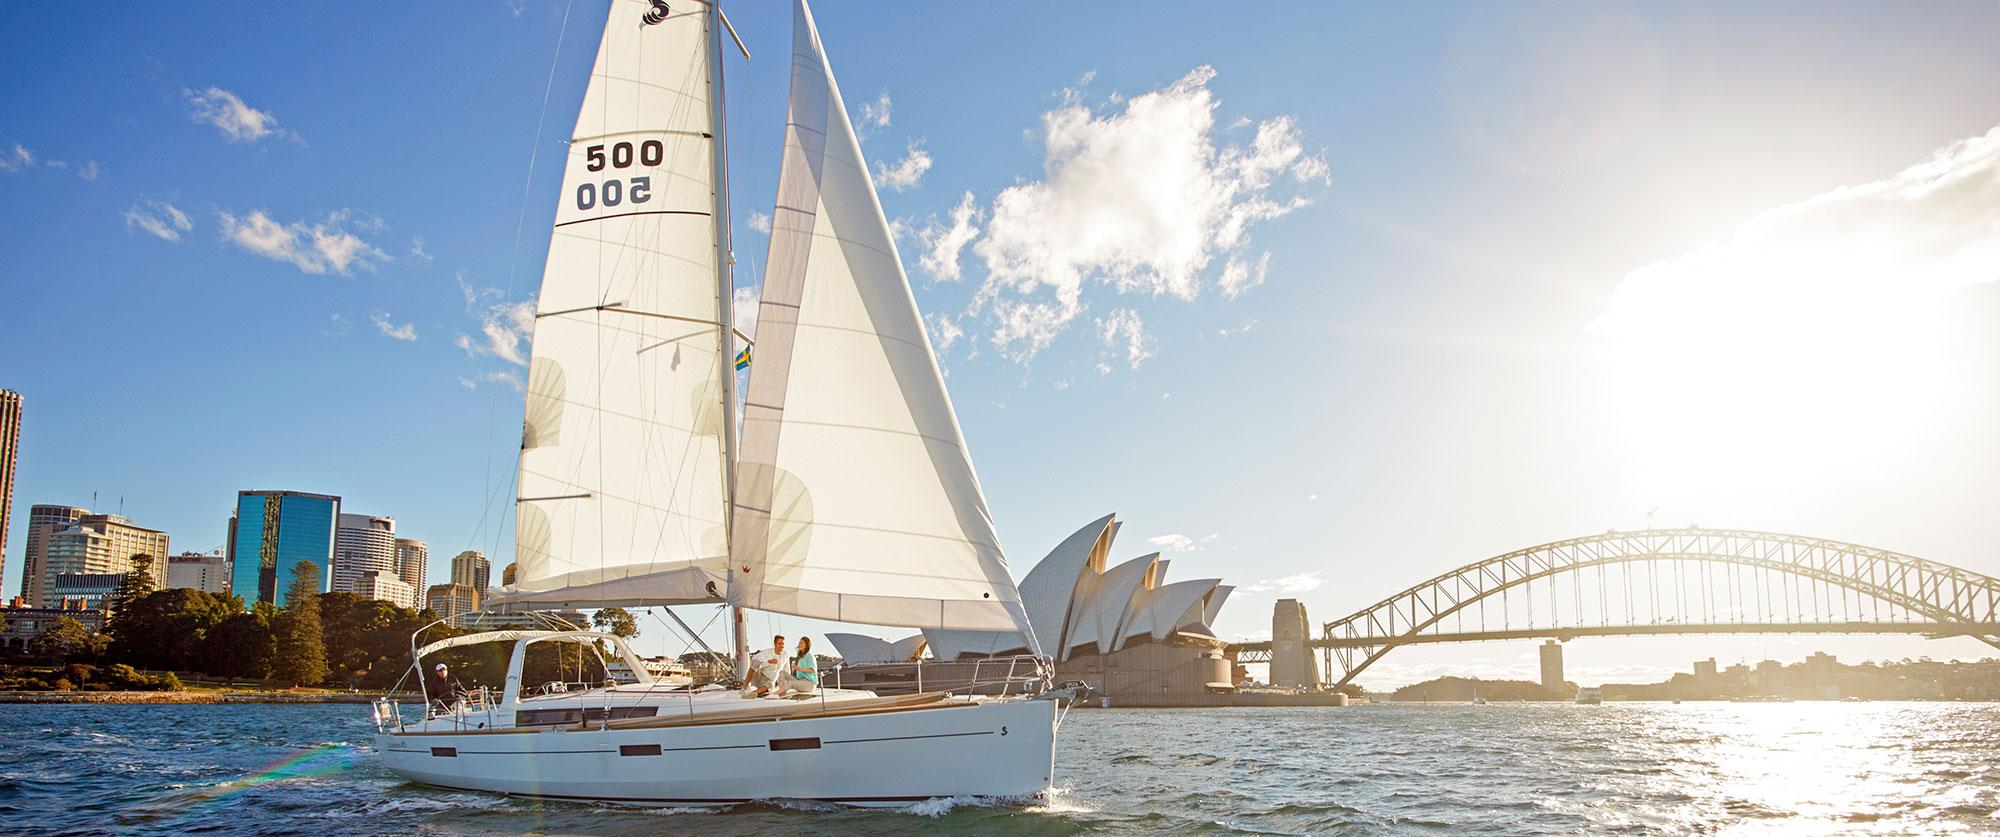 Sailing on Sydney Harbour in Australia